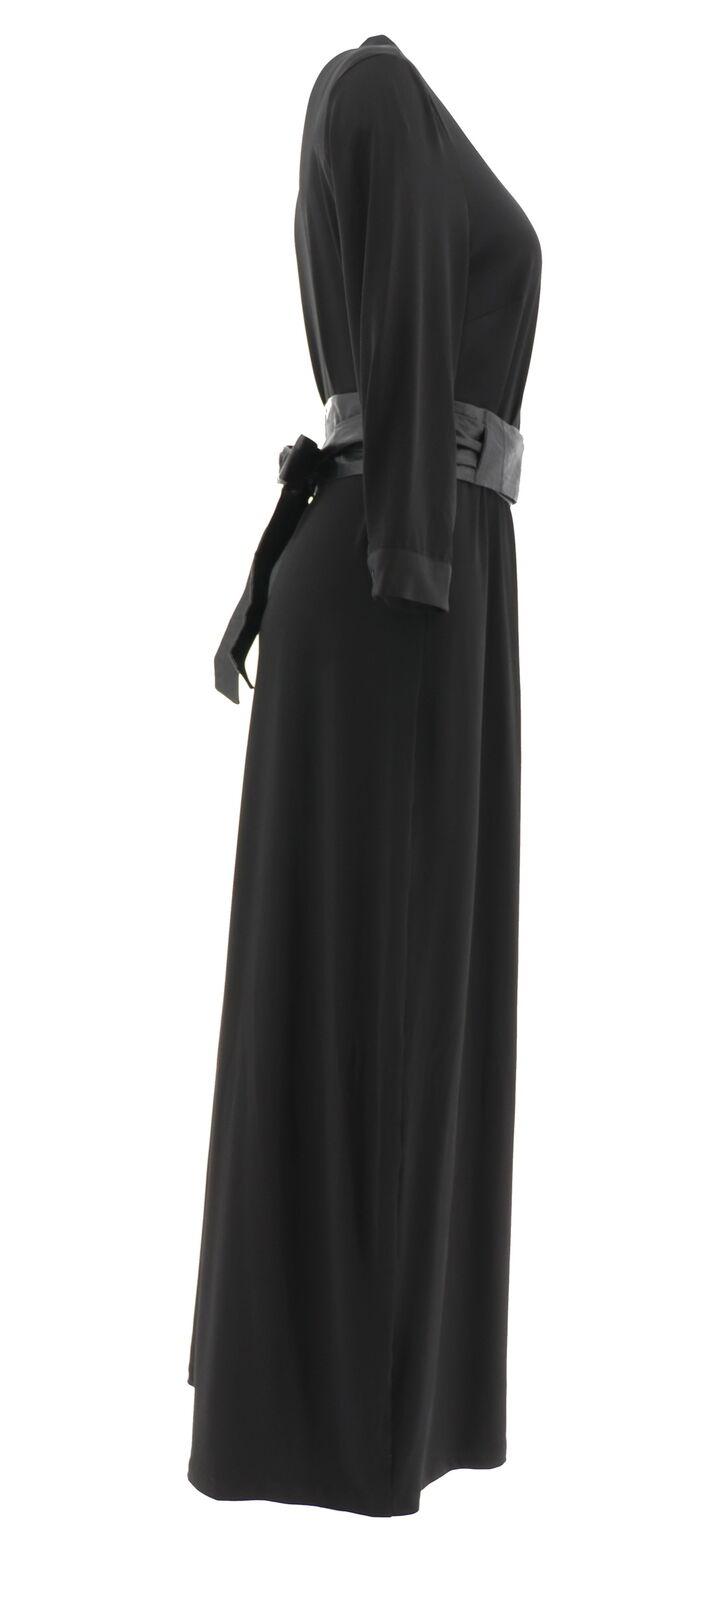 BROOKE SHIELDS Timeless Knit Maxi Dress Belt Black XL NEW A341956